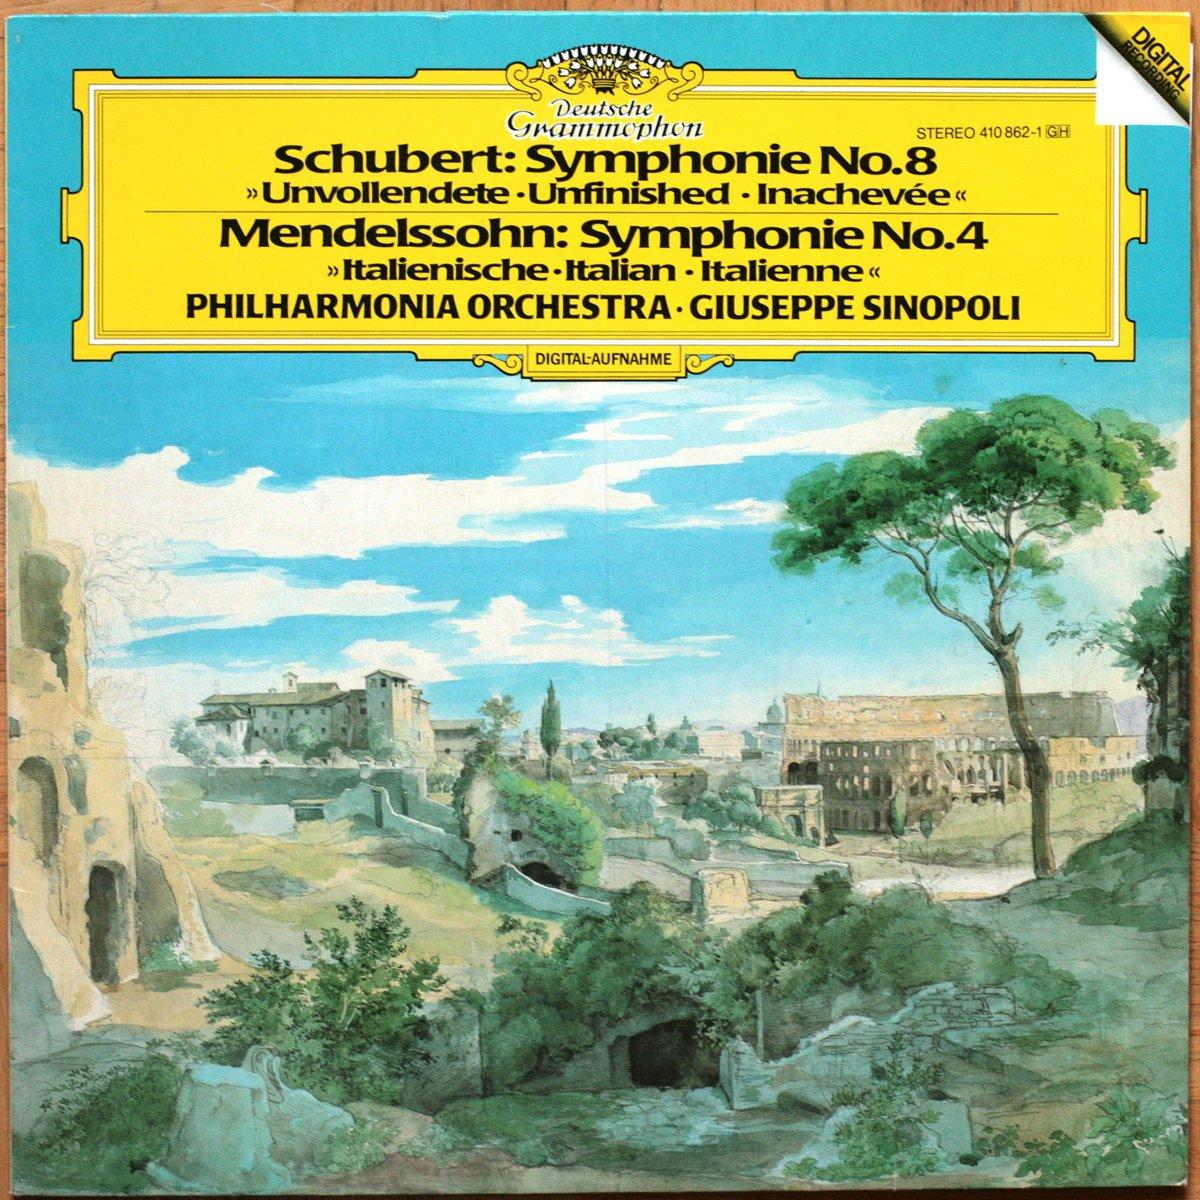 DGG 410 862 Schubert Symphonie 8 Sinopoli DGG Digital Aufnahme